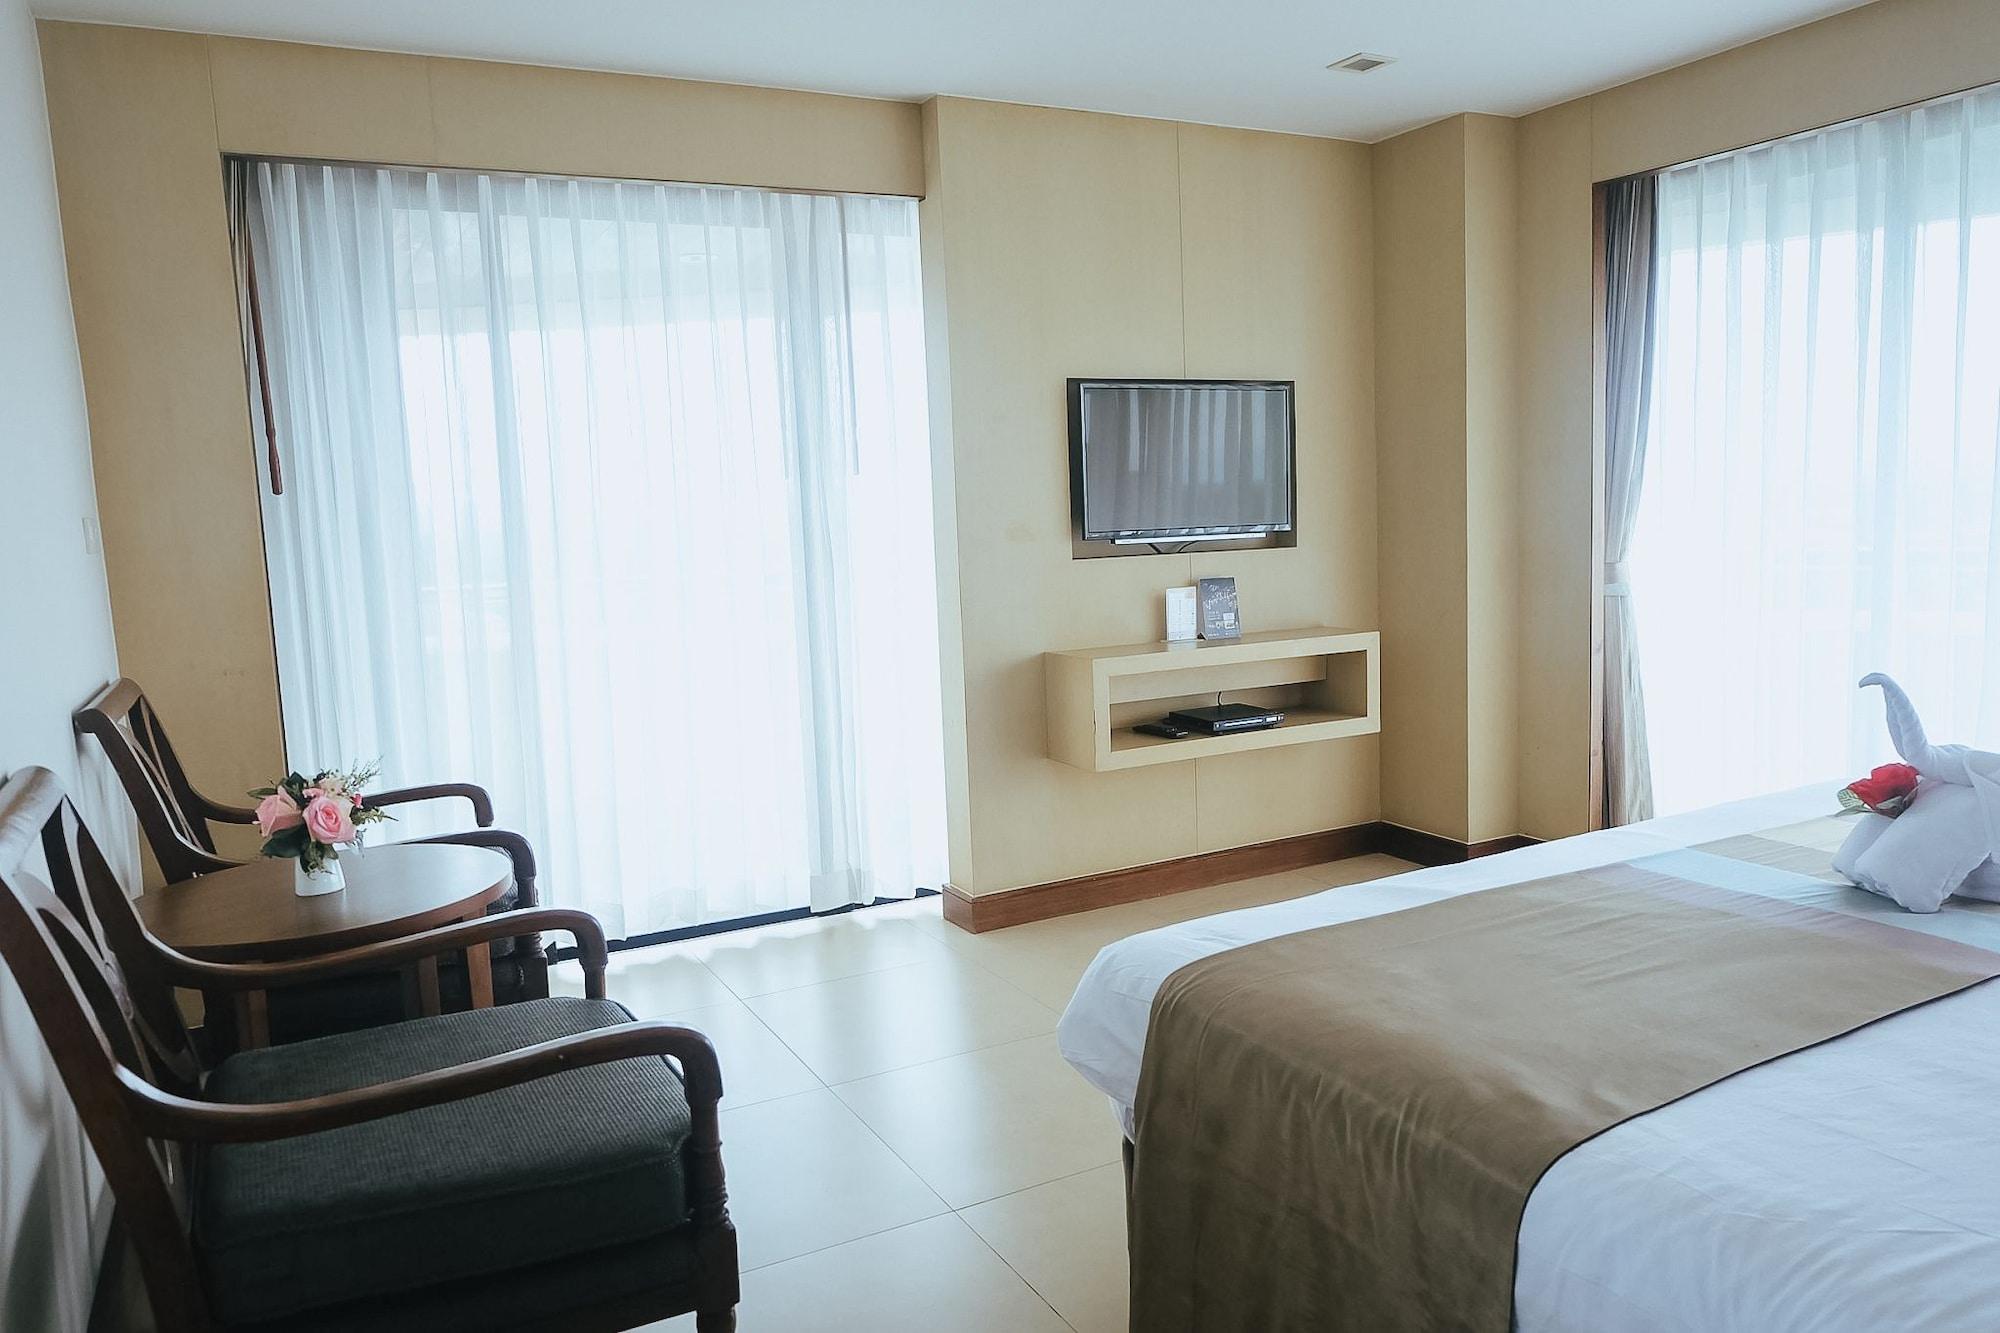 Rua Rasada Hotel - The Ideal Venue for Meetings & Events, Muang Trang